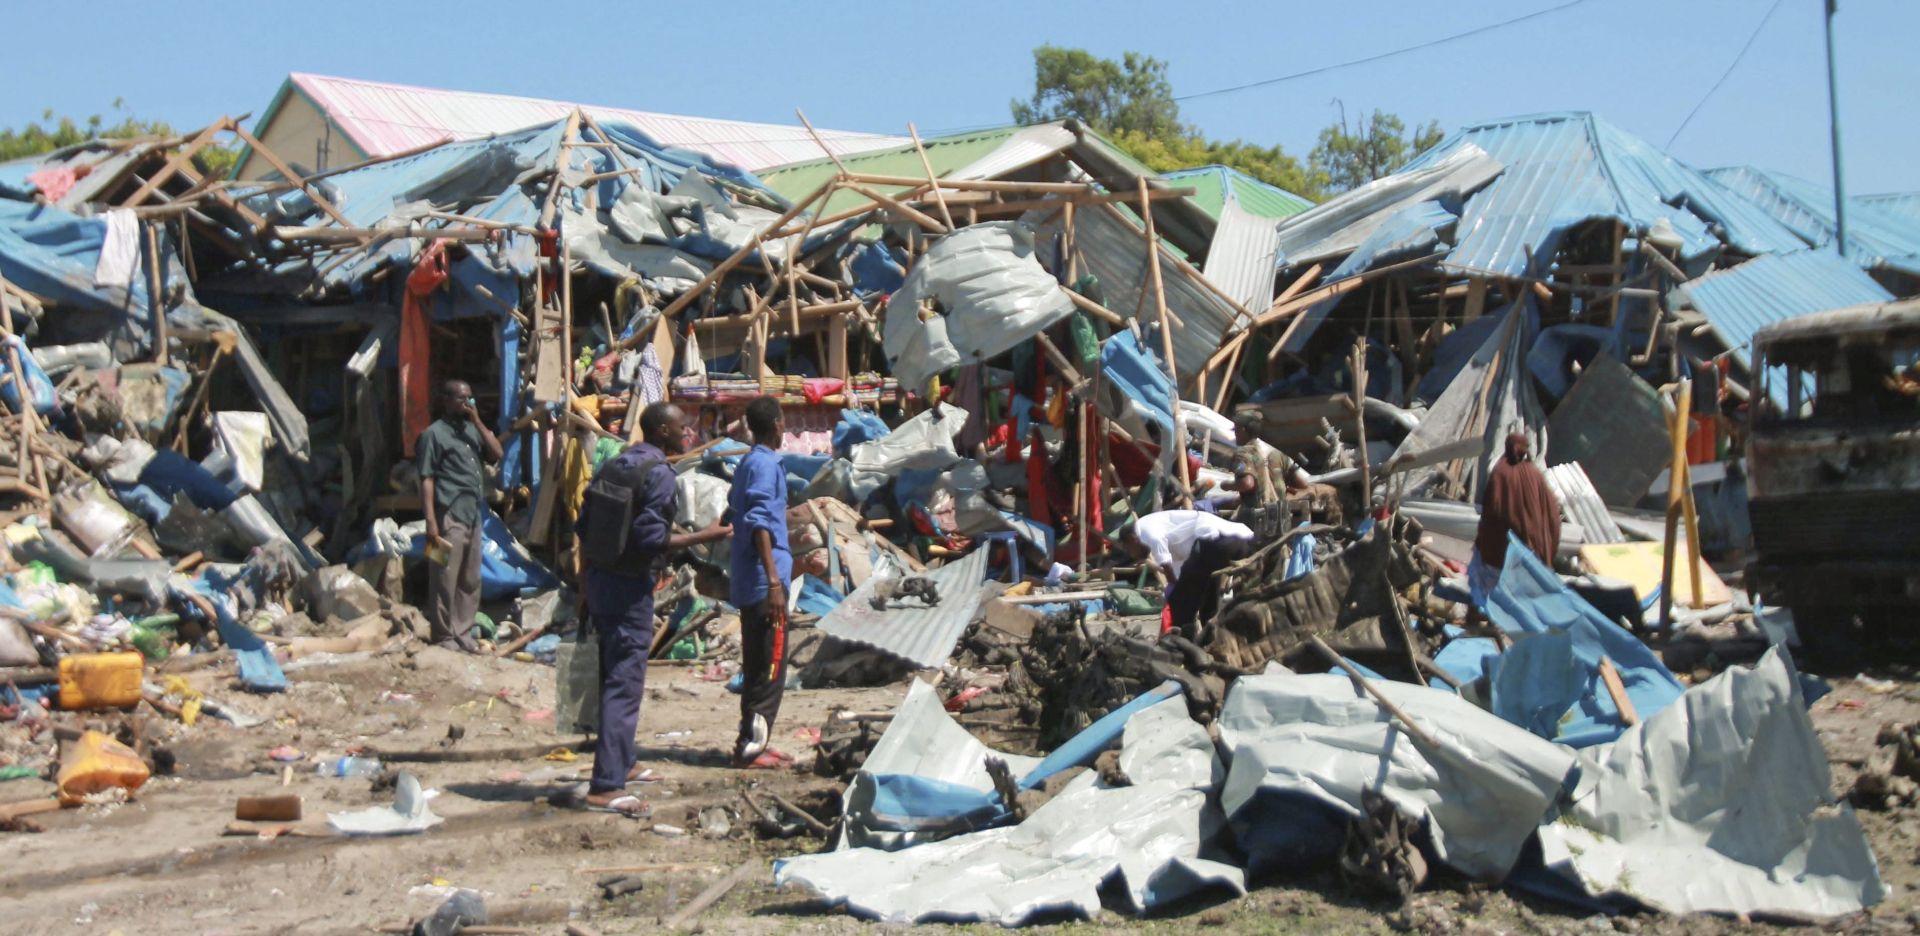 SOMALIJA U eksploziji autobombe kraj tržnice najmanje 10 mrtvih